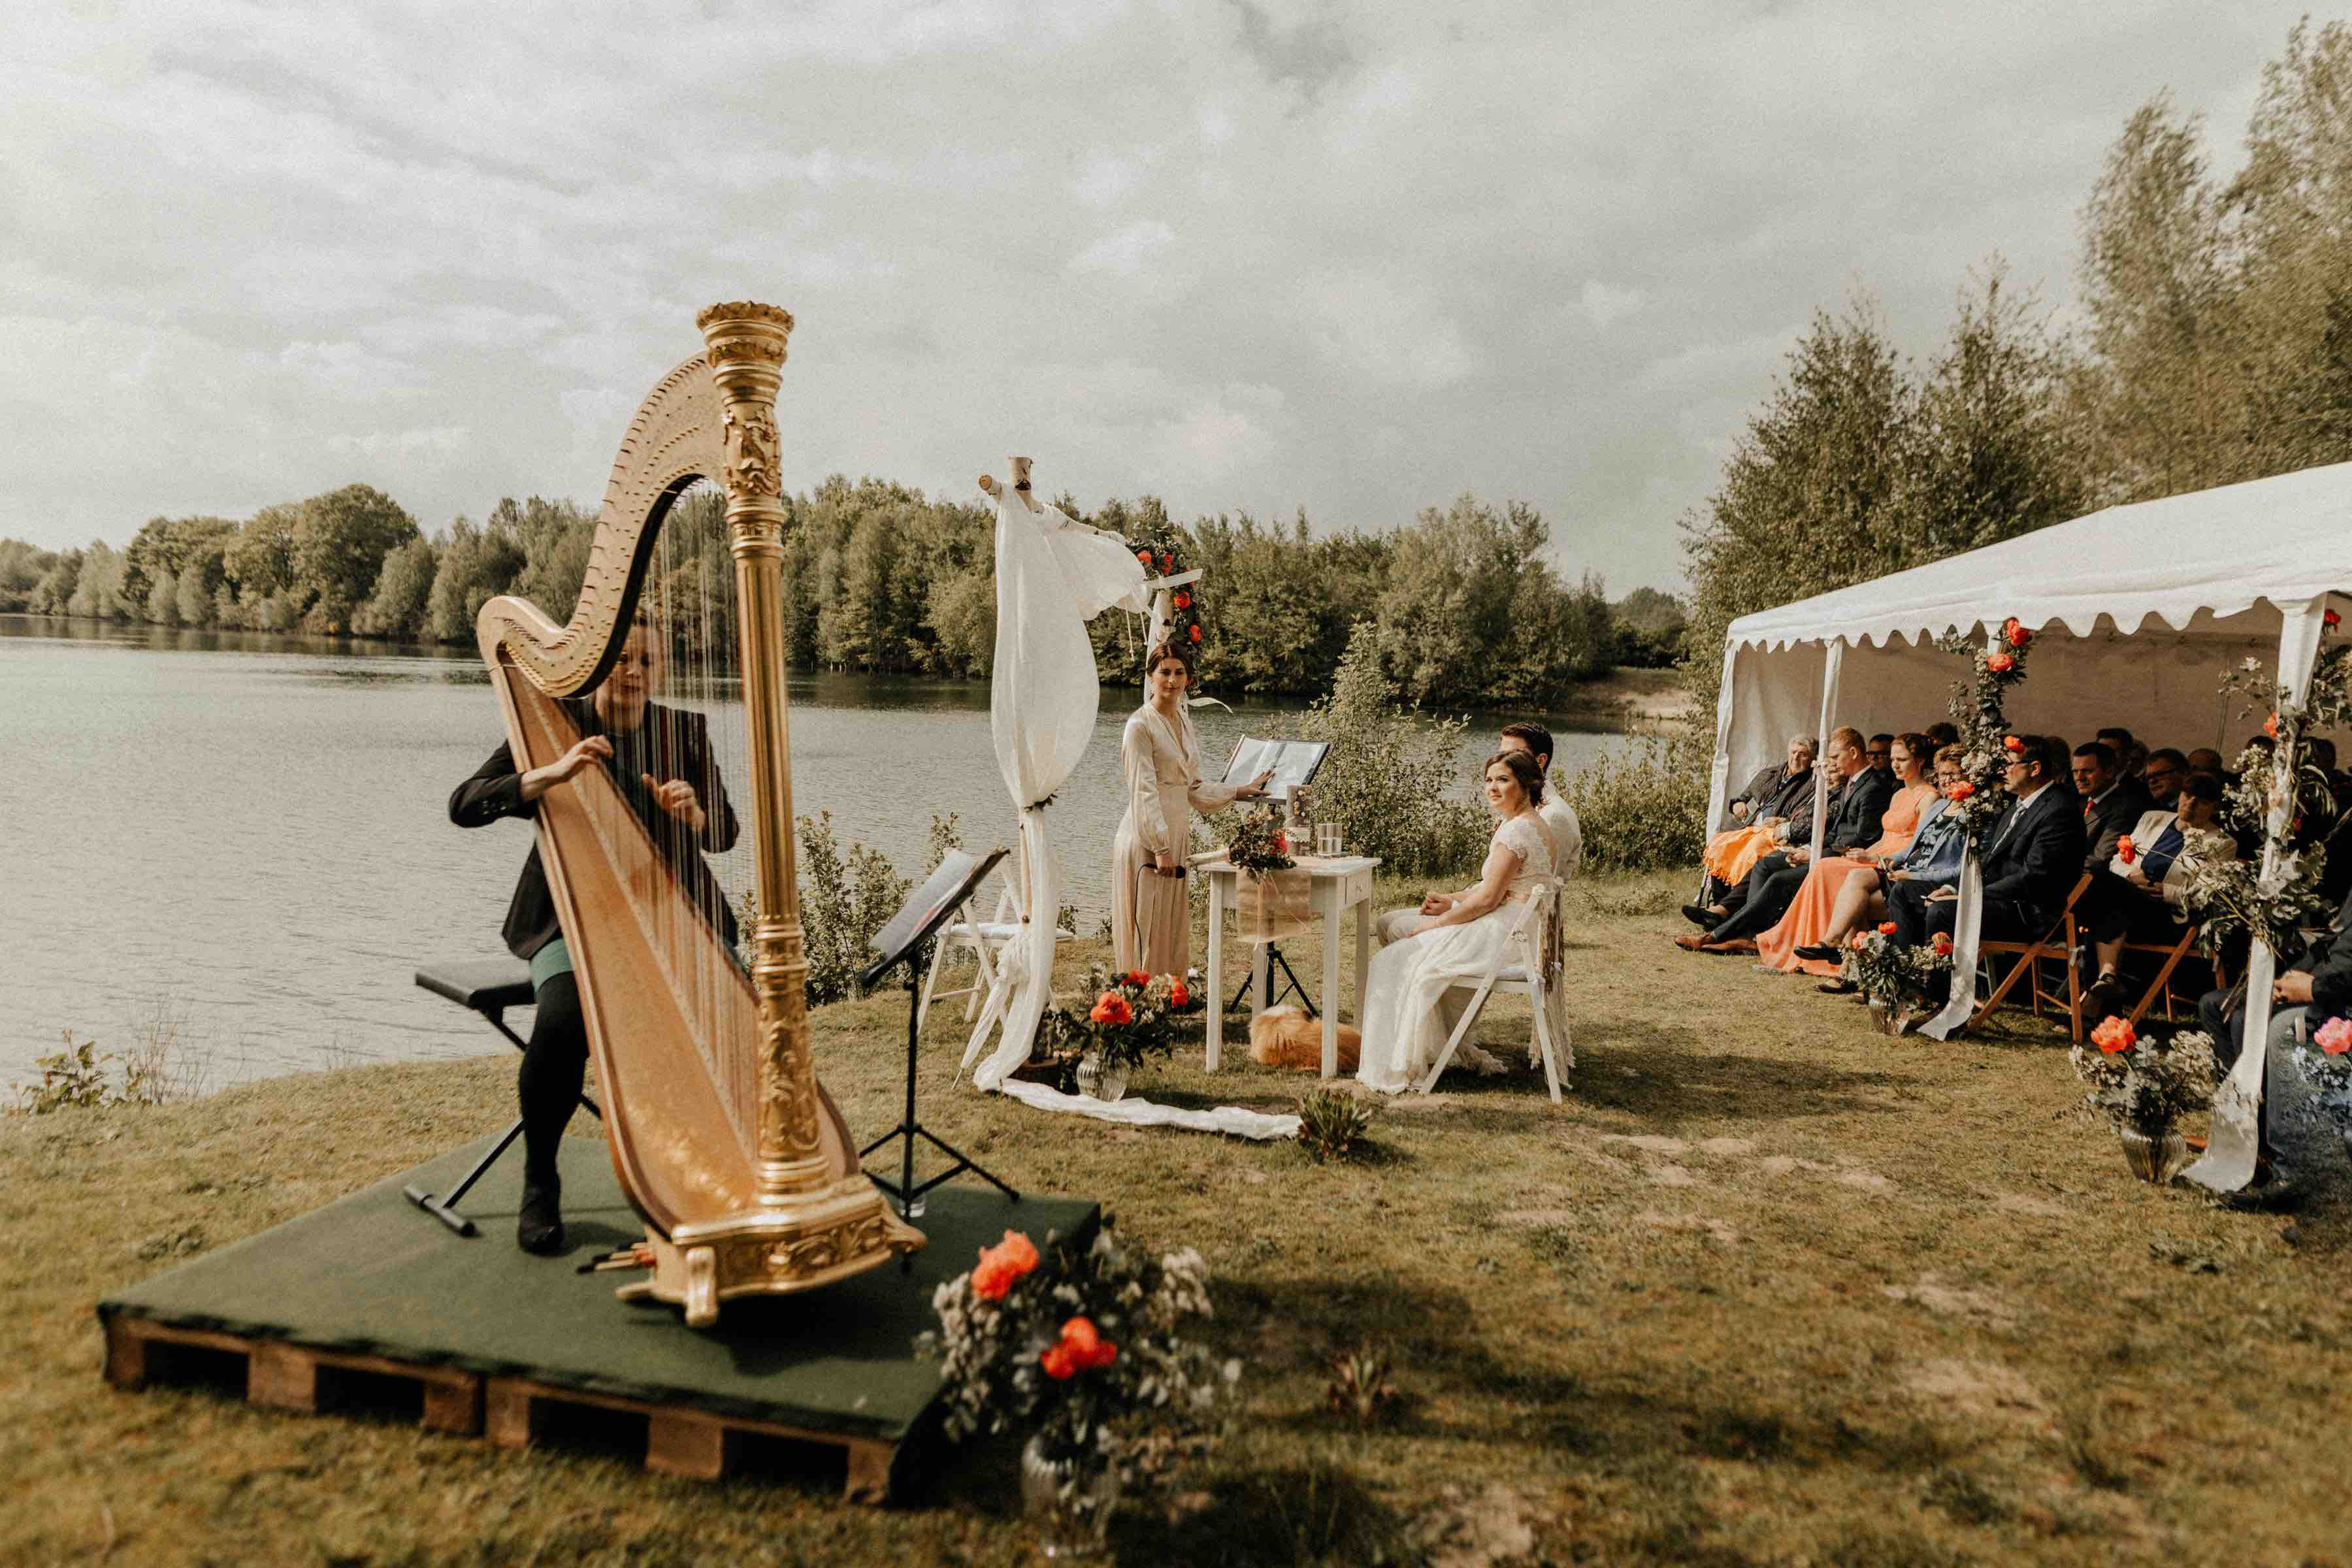 Freie Trauung mit Harfe am See